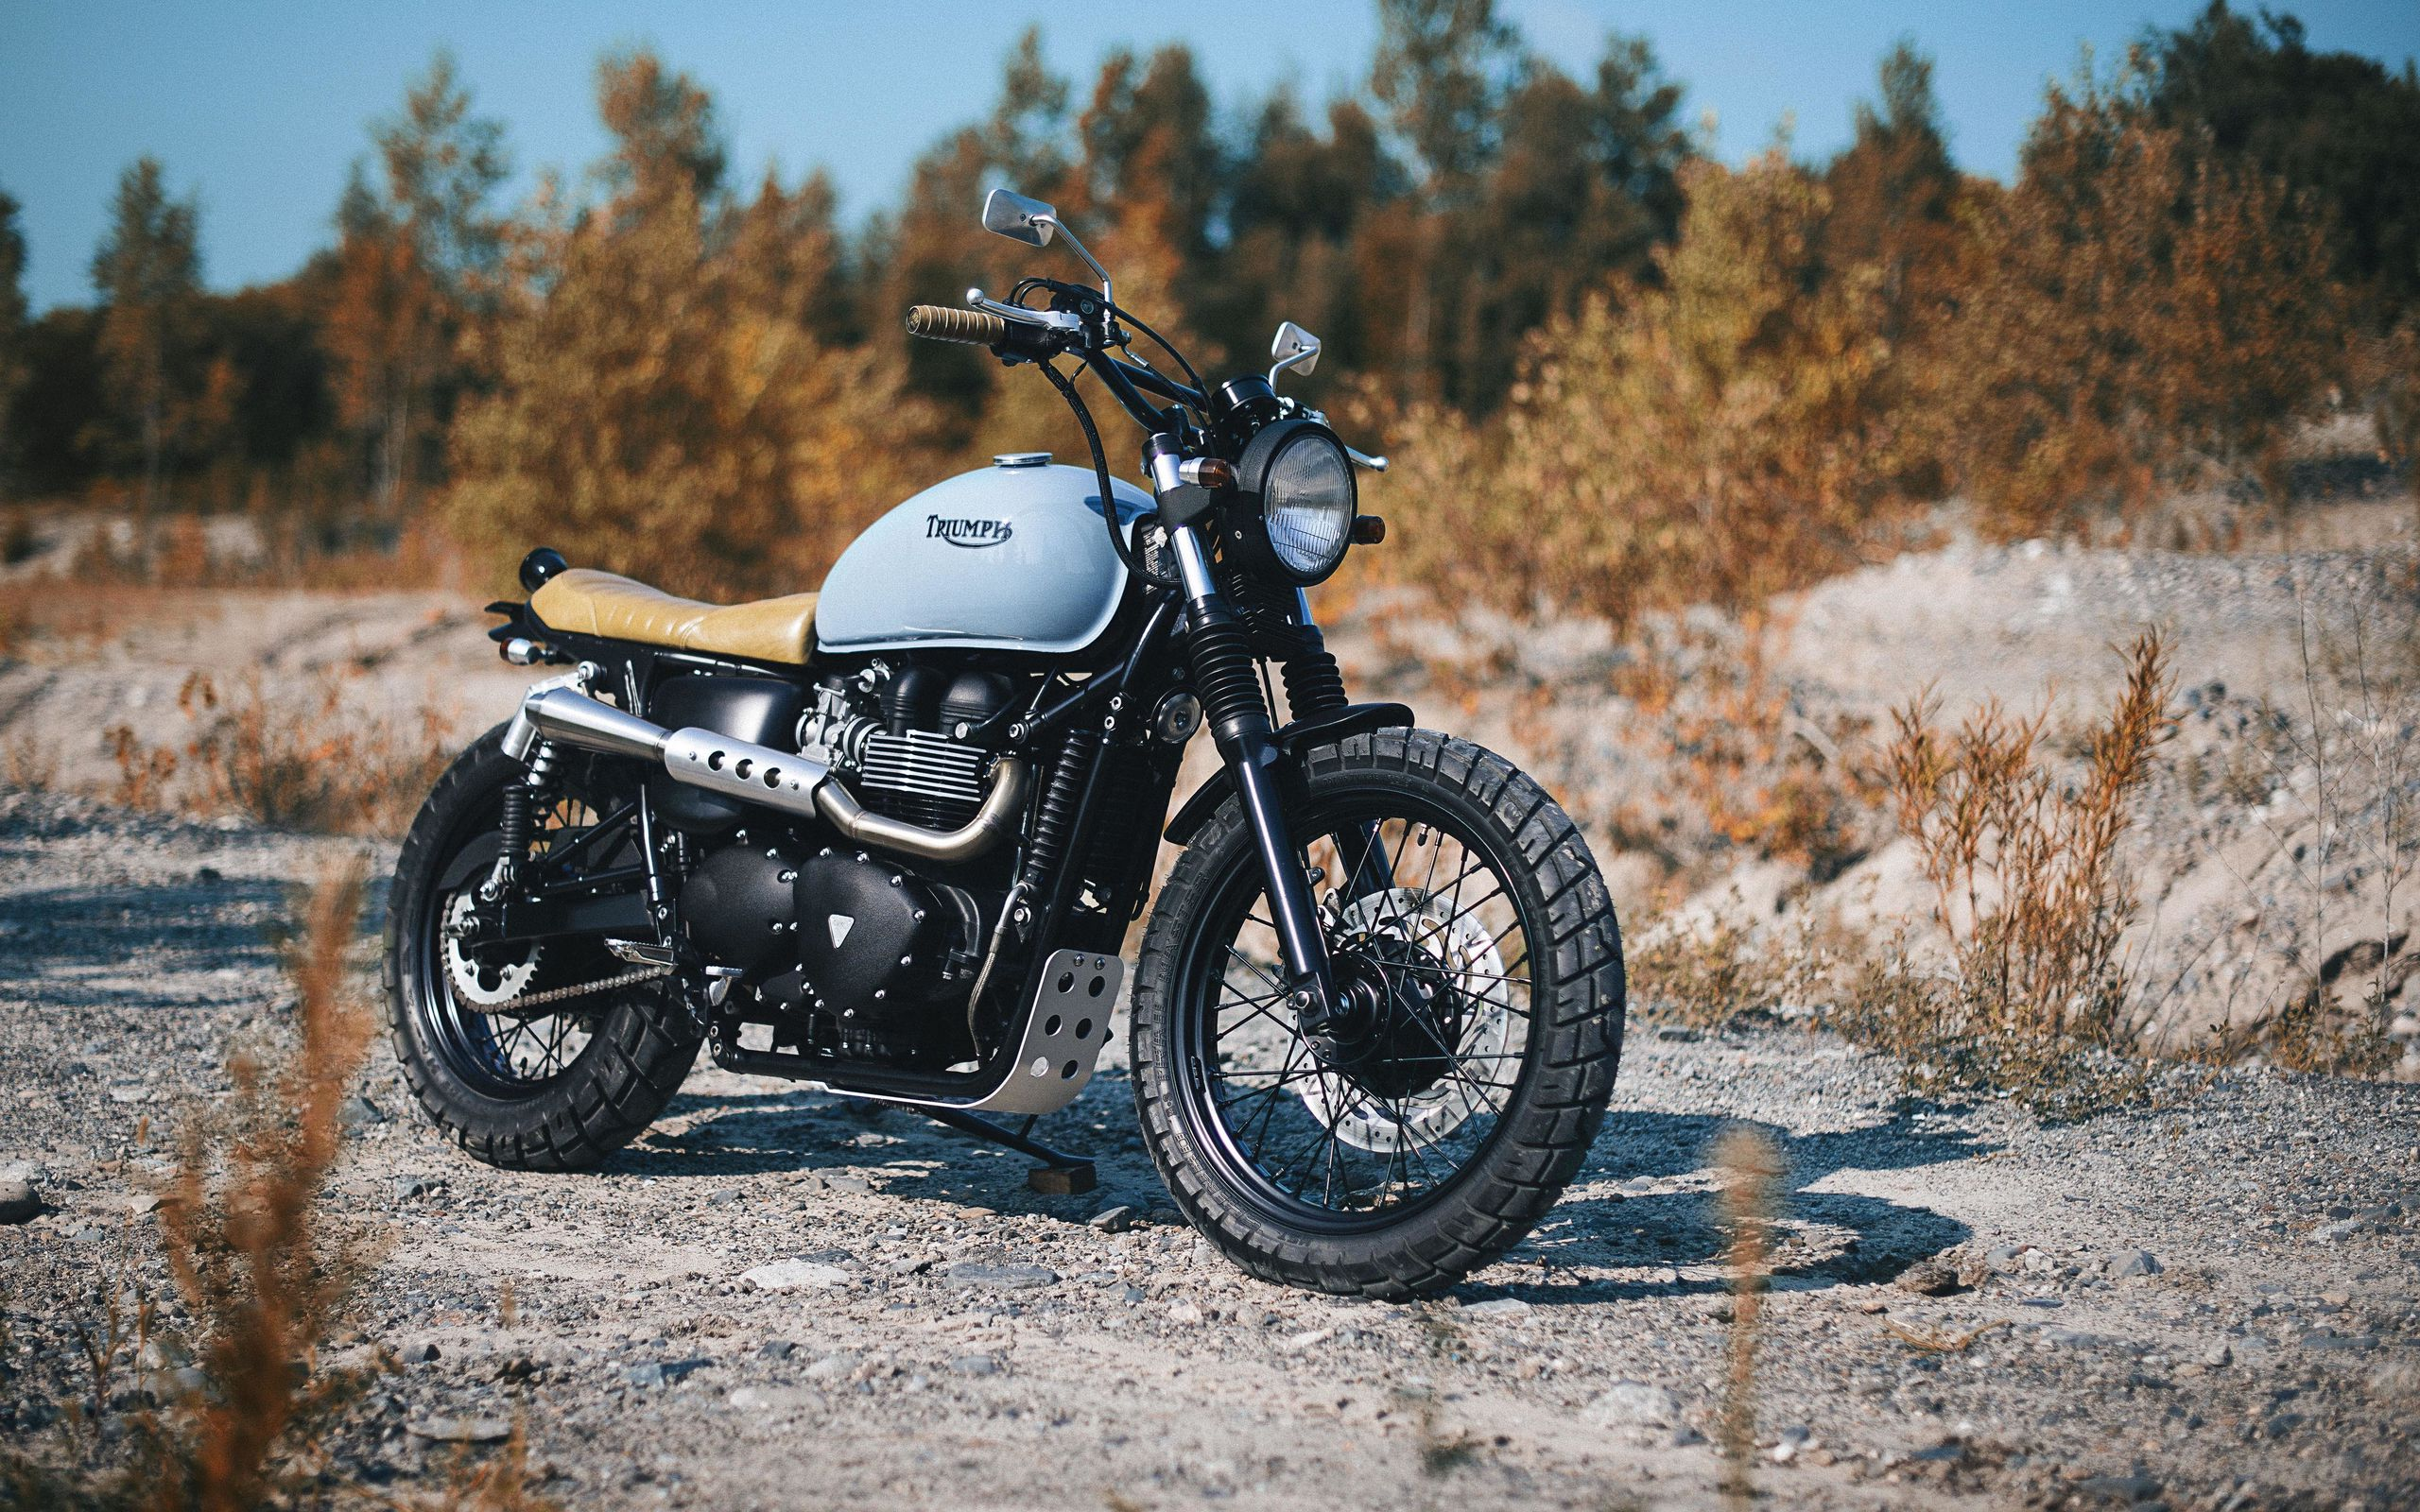 2560x1600 Обои triumph, bonneville, мотоцикл, вид сбоку